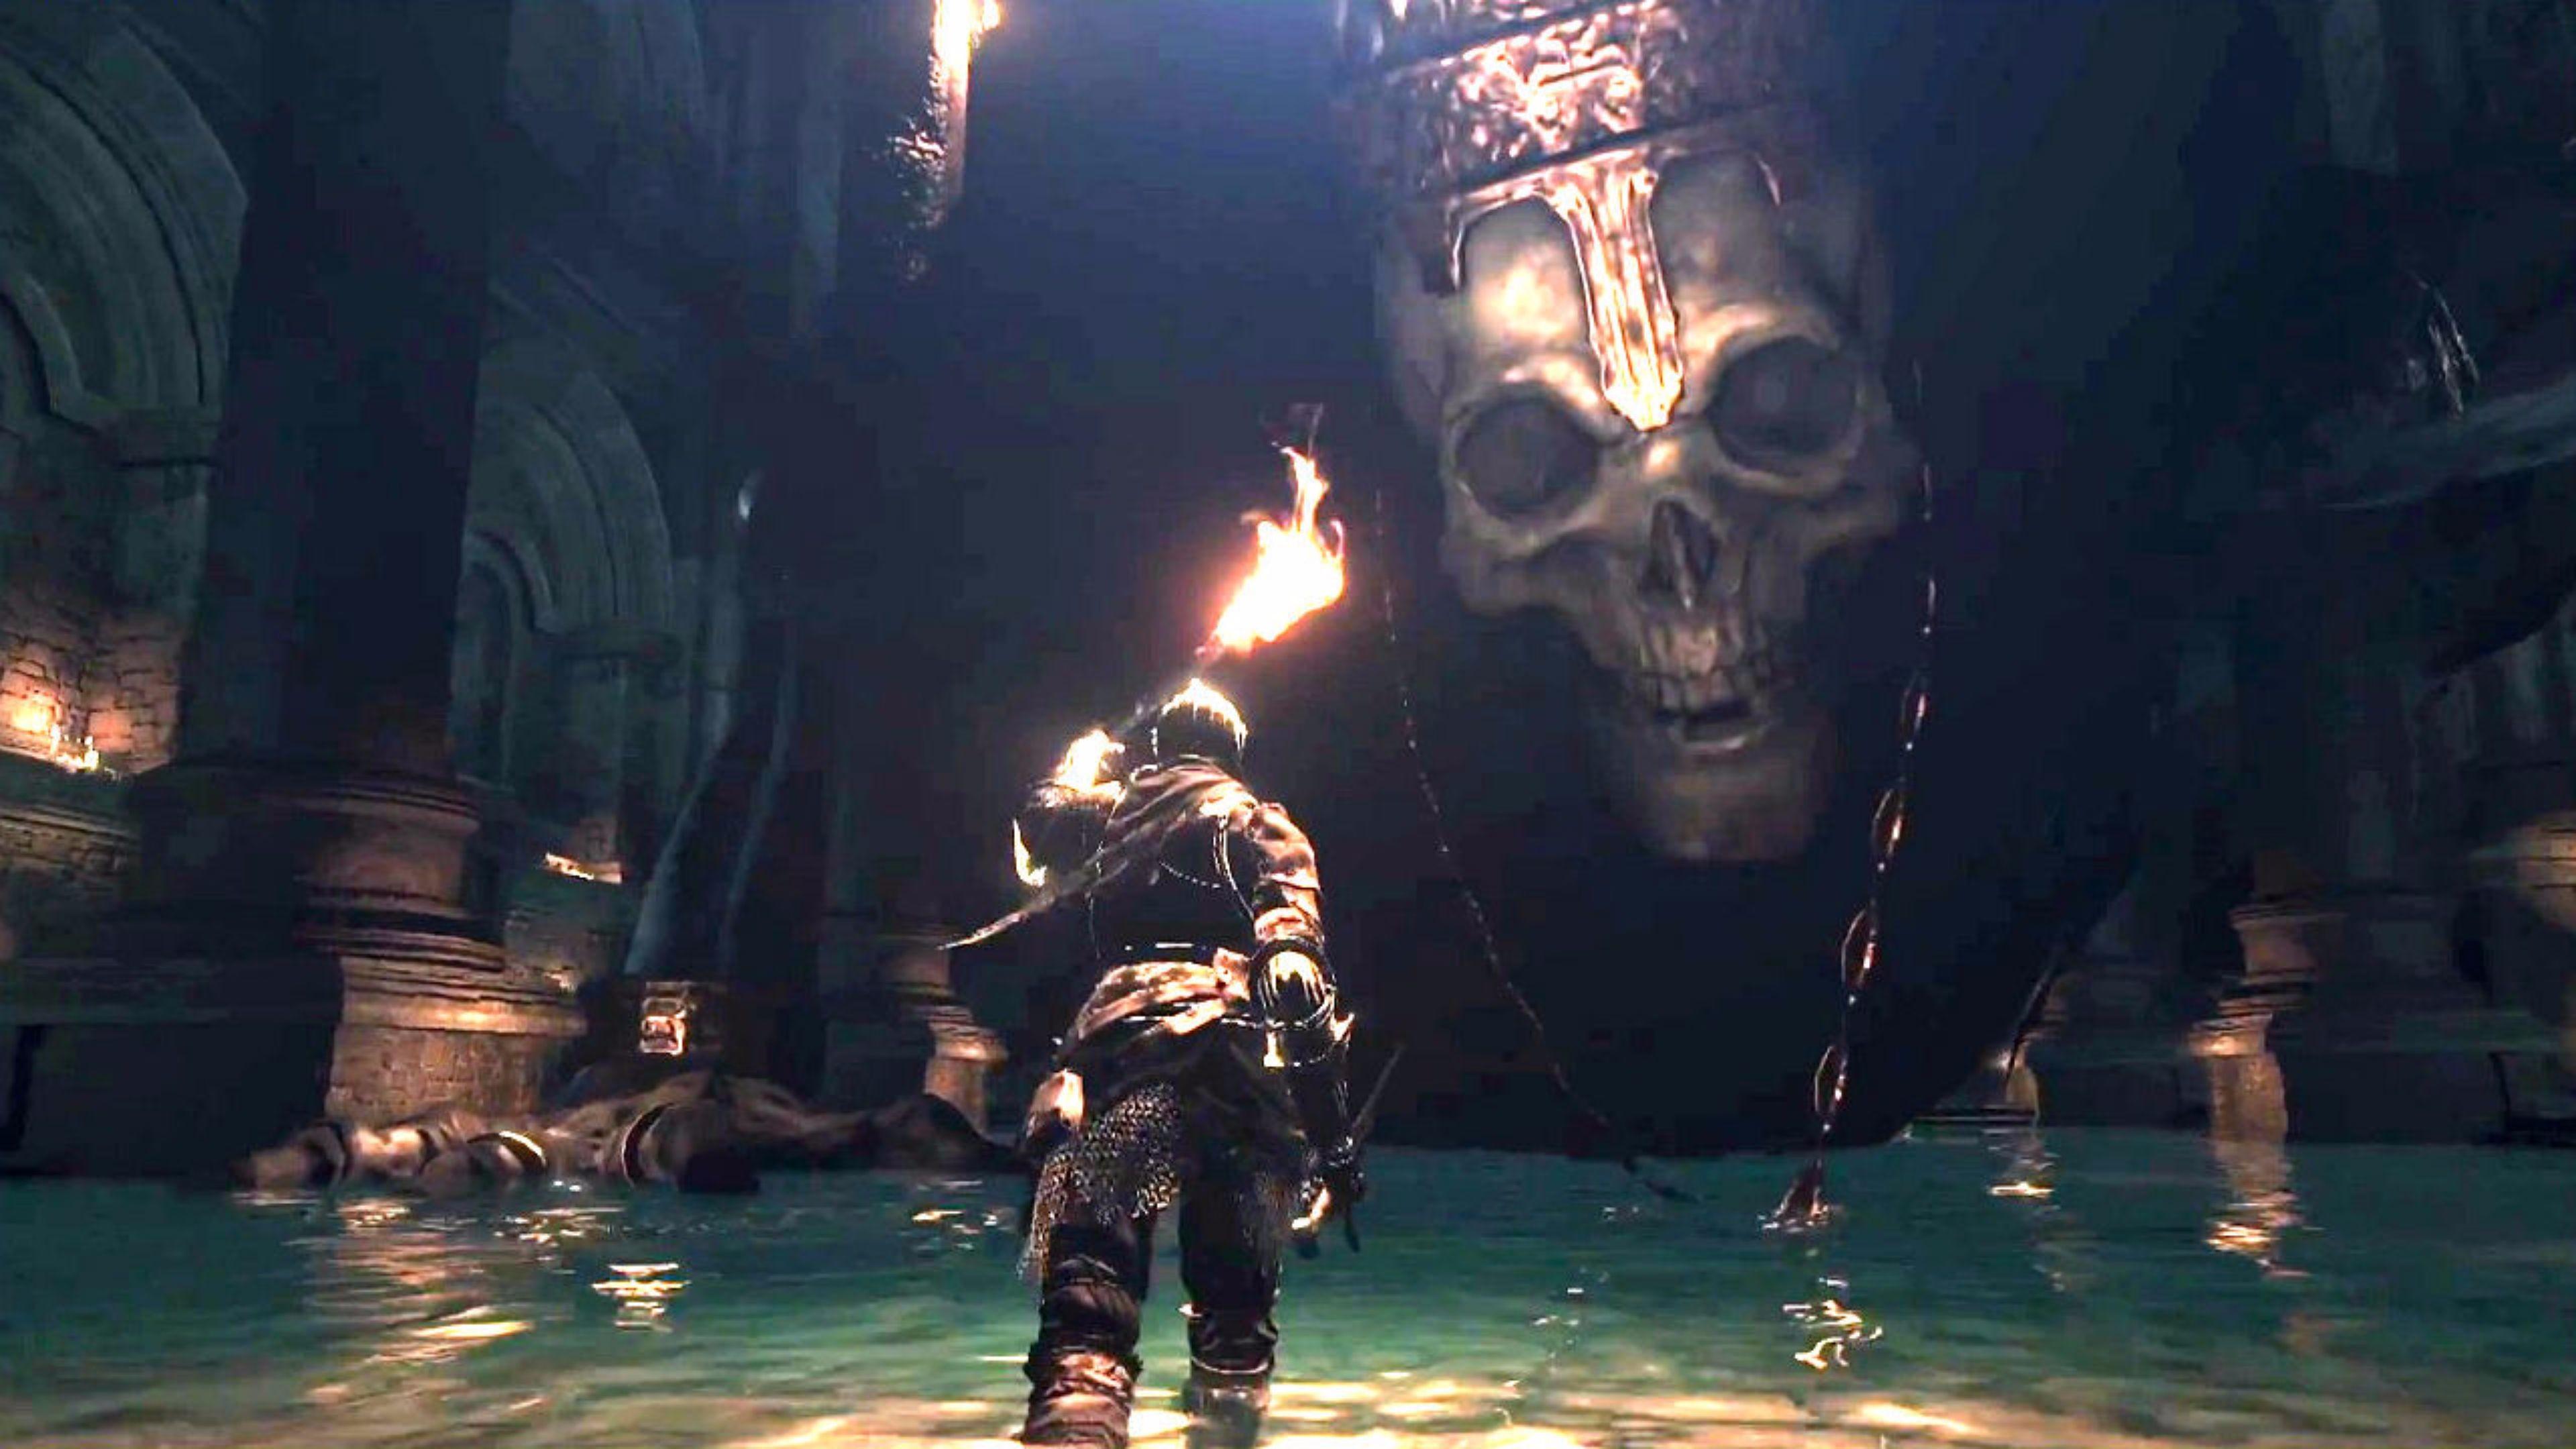 Game of the Year Dark Souls 3 4K Wallpapers | Free 4K Wallpaper .